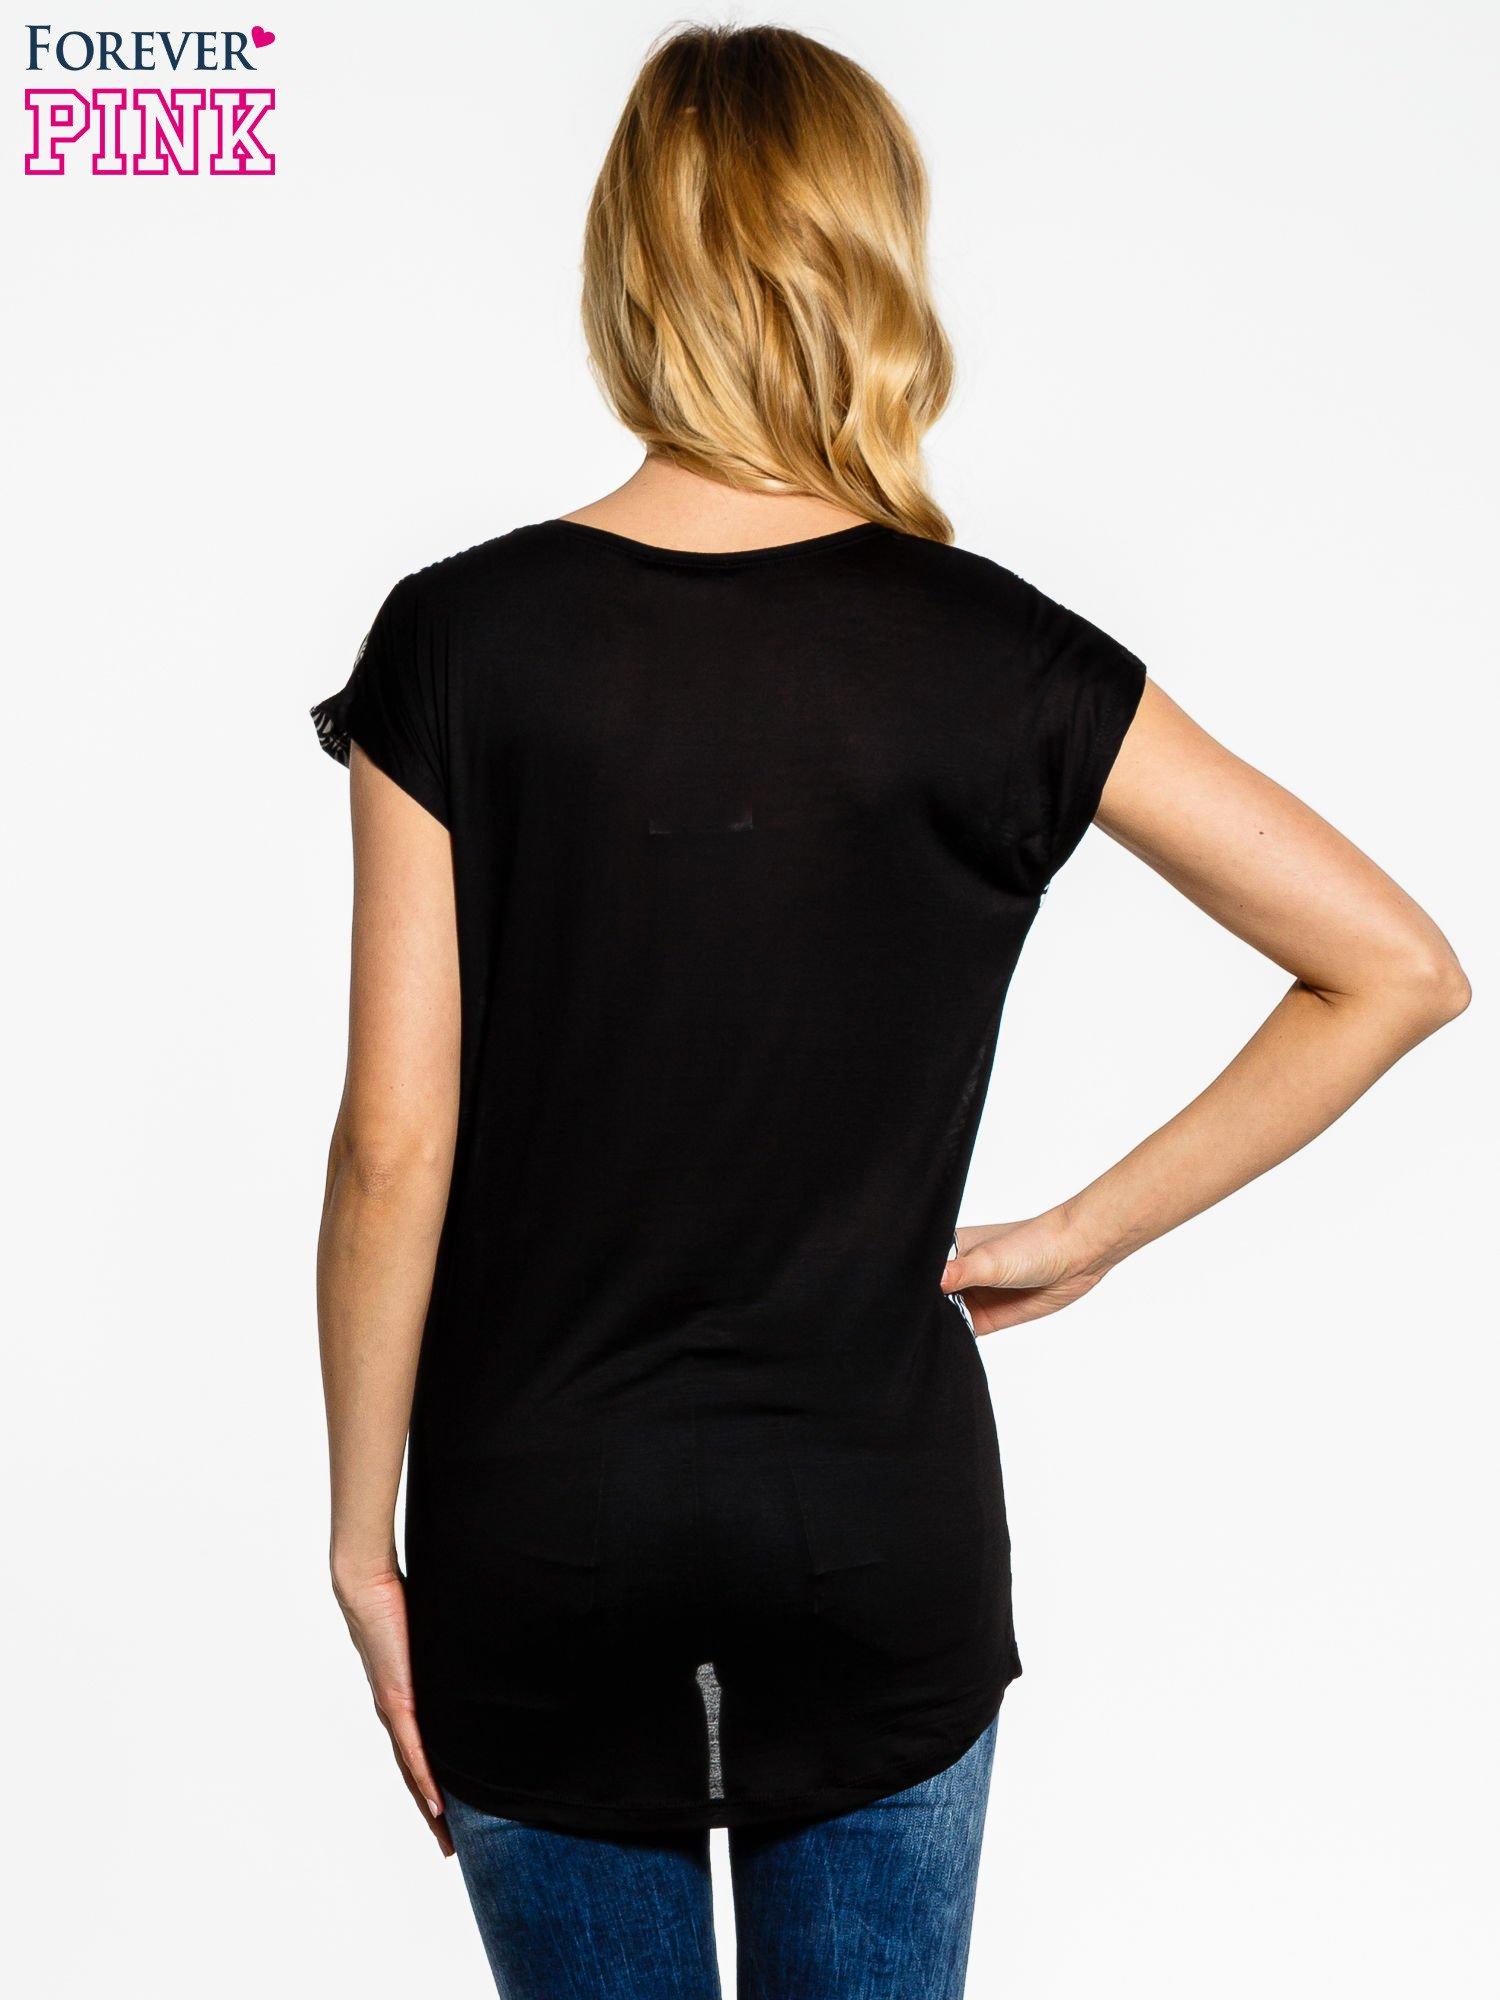 Czarno-biały t-shirt we wzory op-art                                  zdj.                                  2